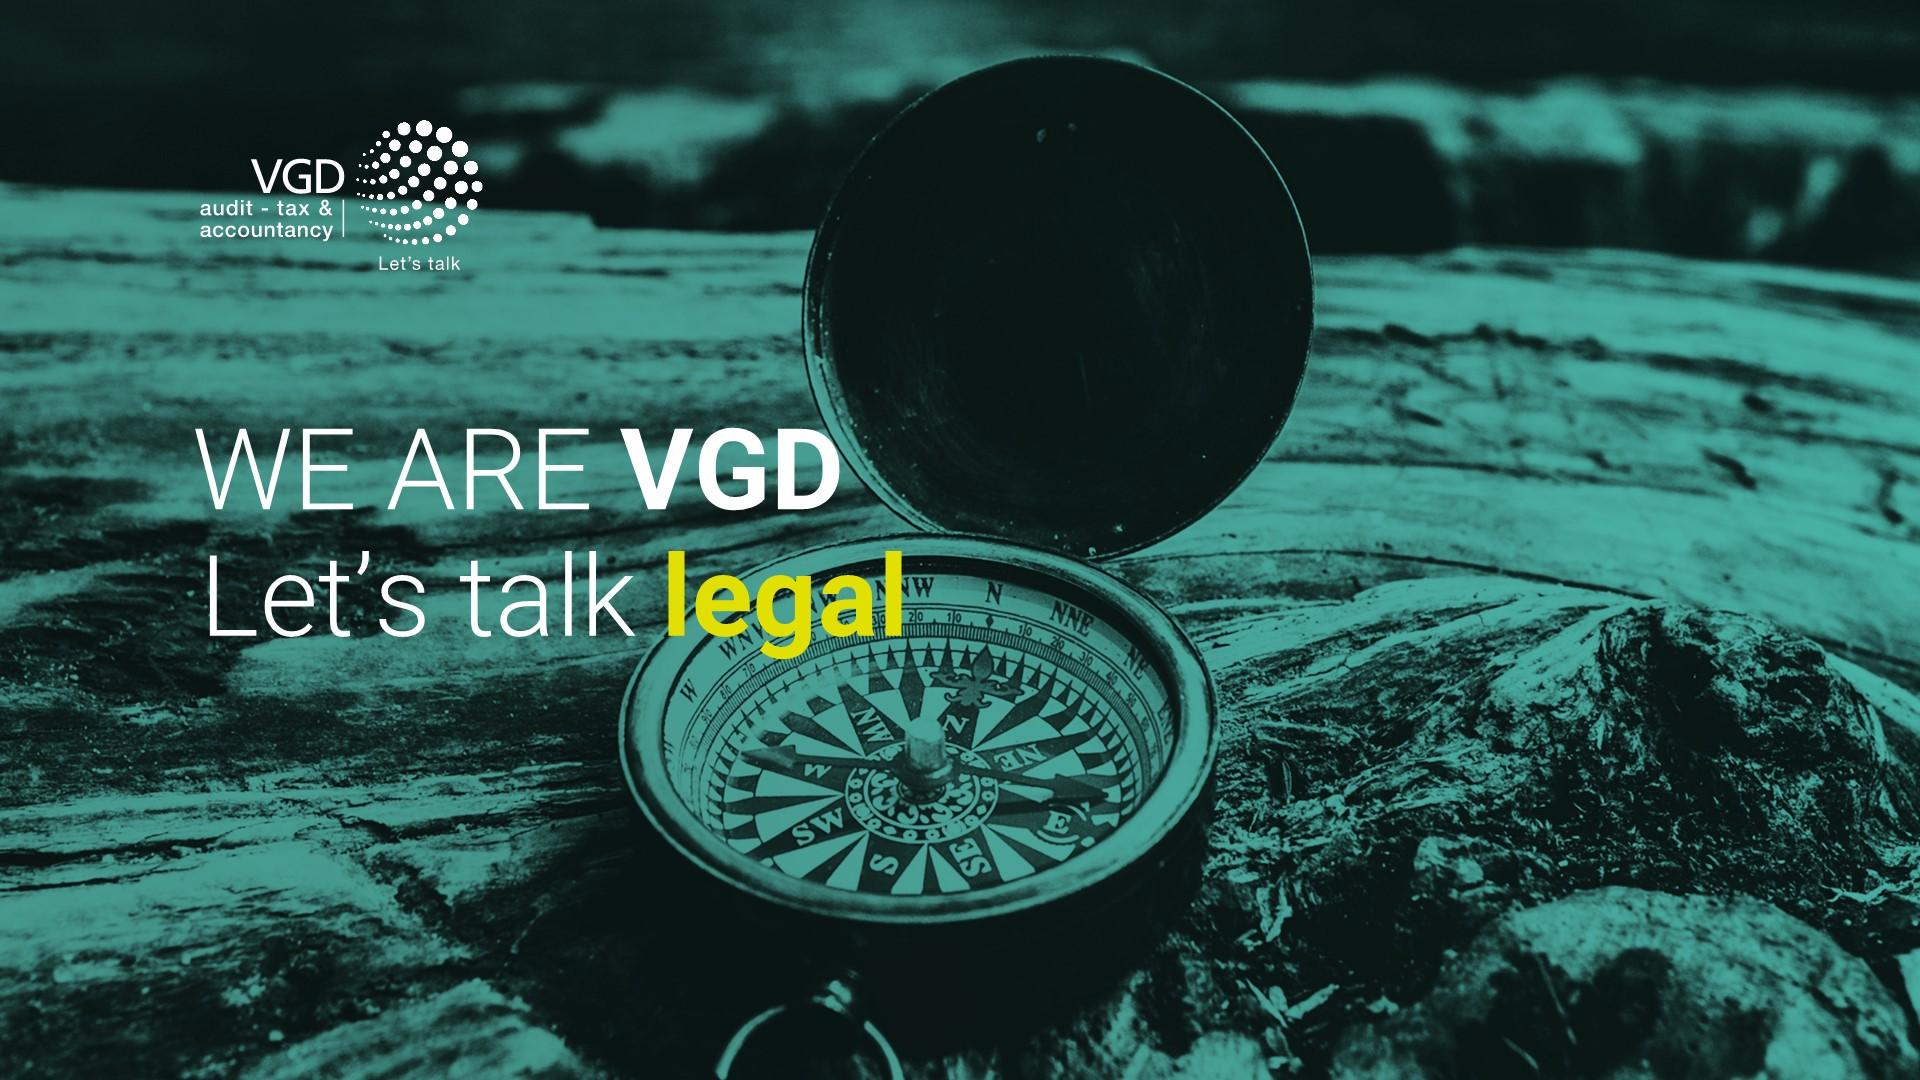 lets talk legal